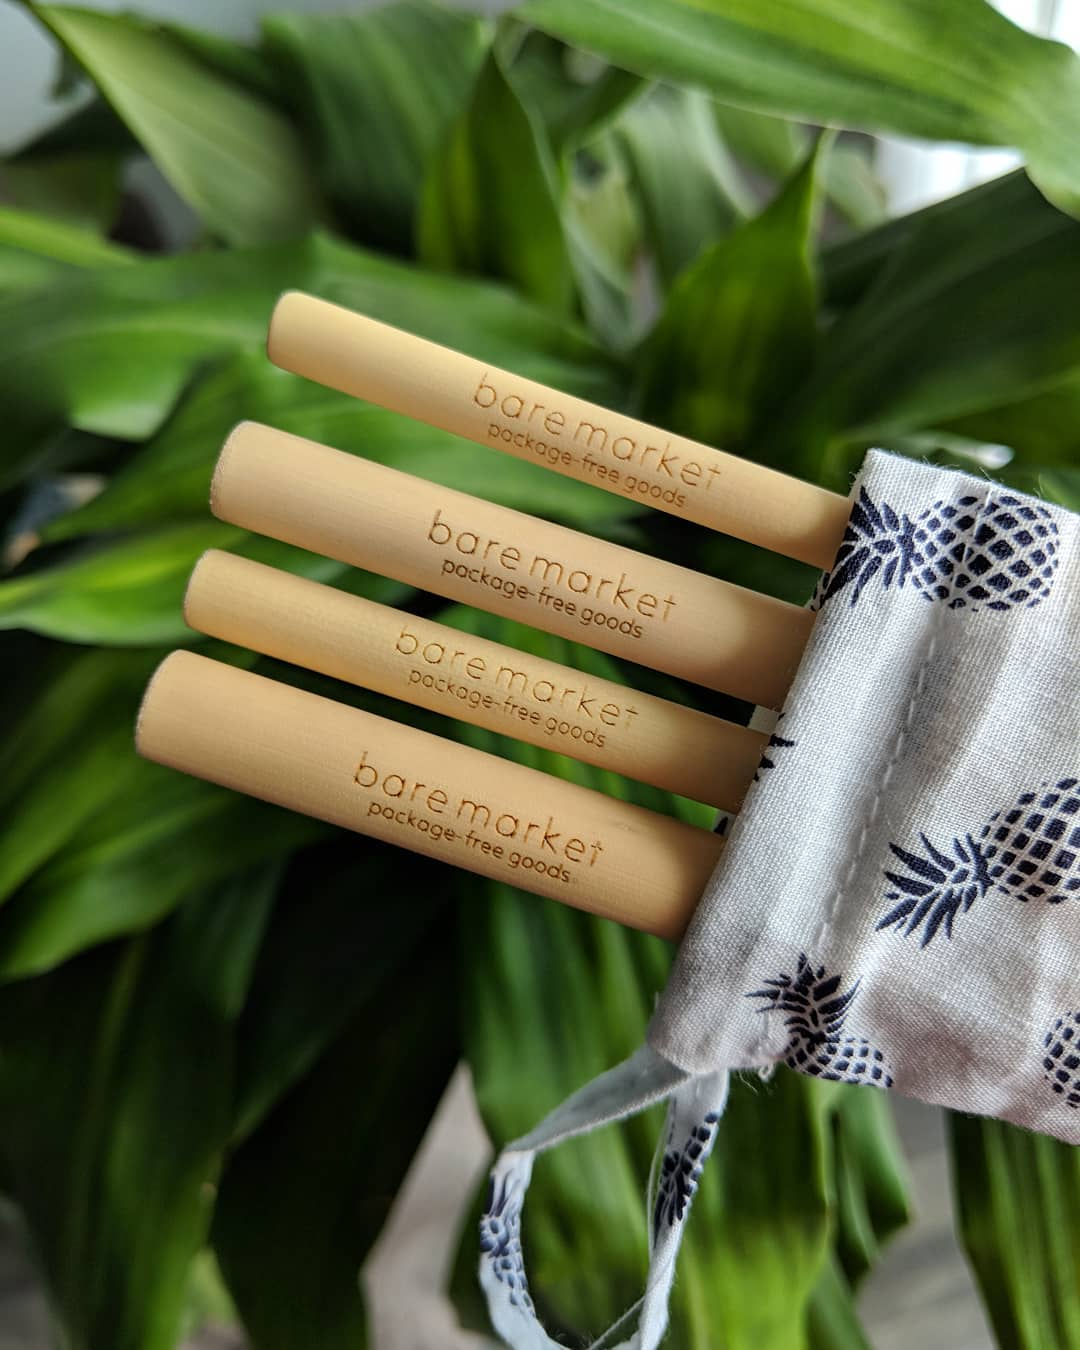 proveedor pajitas de bambu al por mayor - Bali Boo